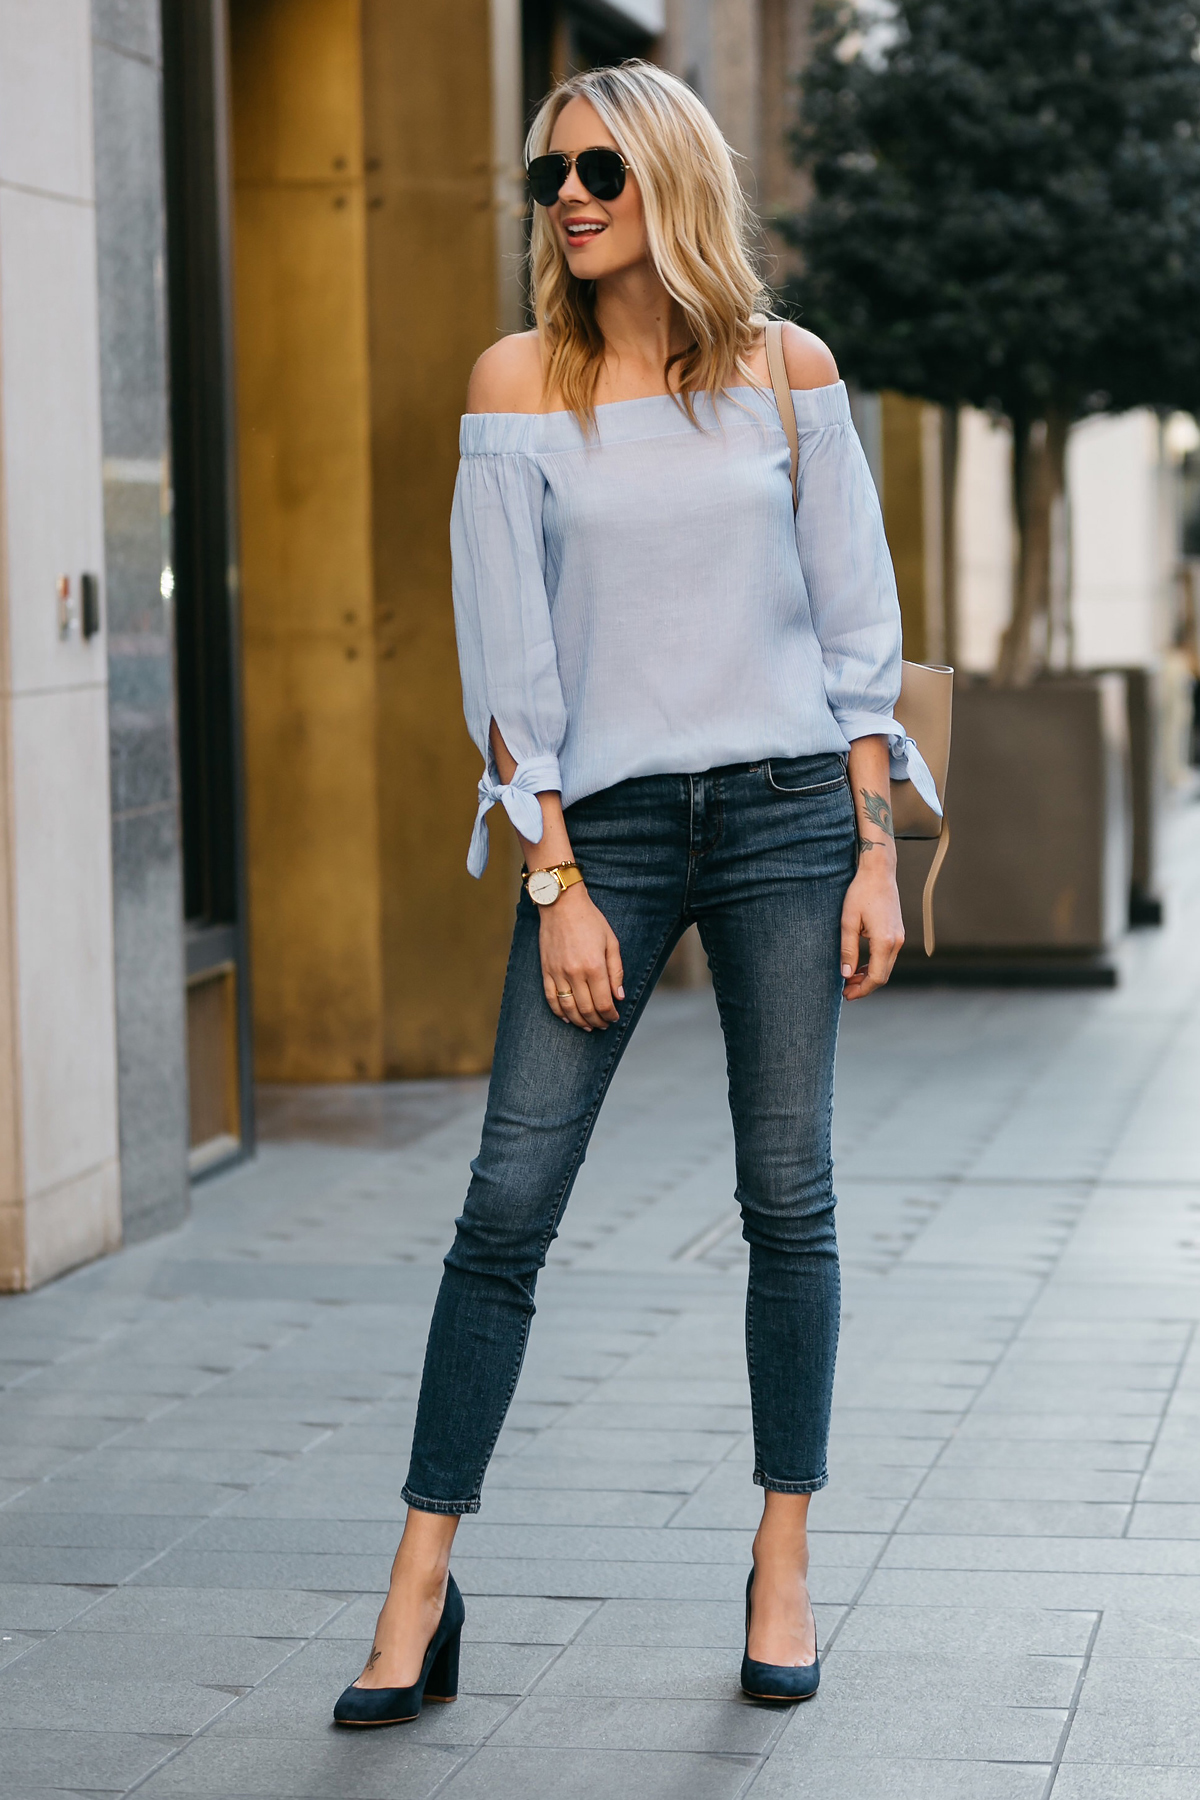 Fashion Jackson, Dallas Blogger, Fashion Blogger, Street Style, Ann Taylor Blue Tie Off-the-shoulder Top, Denim Skinny Jeans, Navy Suede Block Heel Pumps, Celine Belt Bag, Celine Aviator Sunglasses